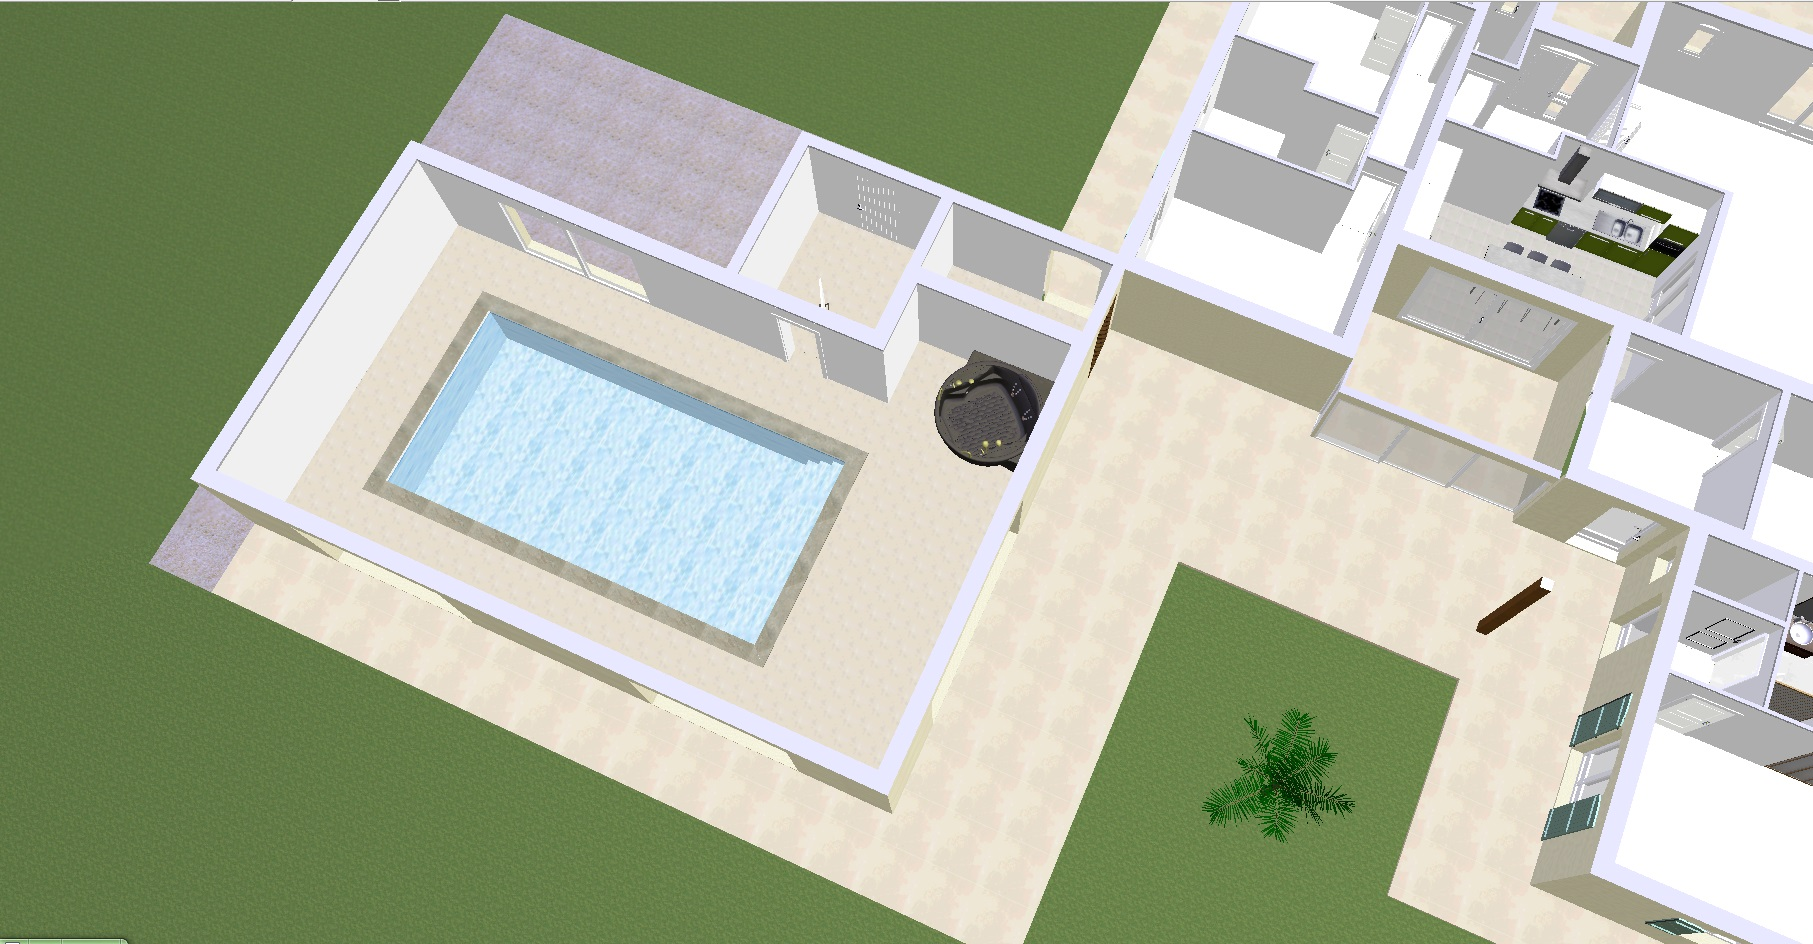 Projet 8 Vue de dessus espace piscine